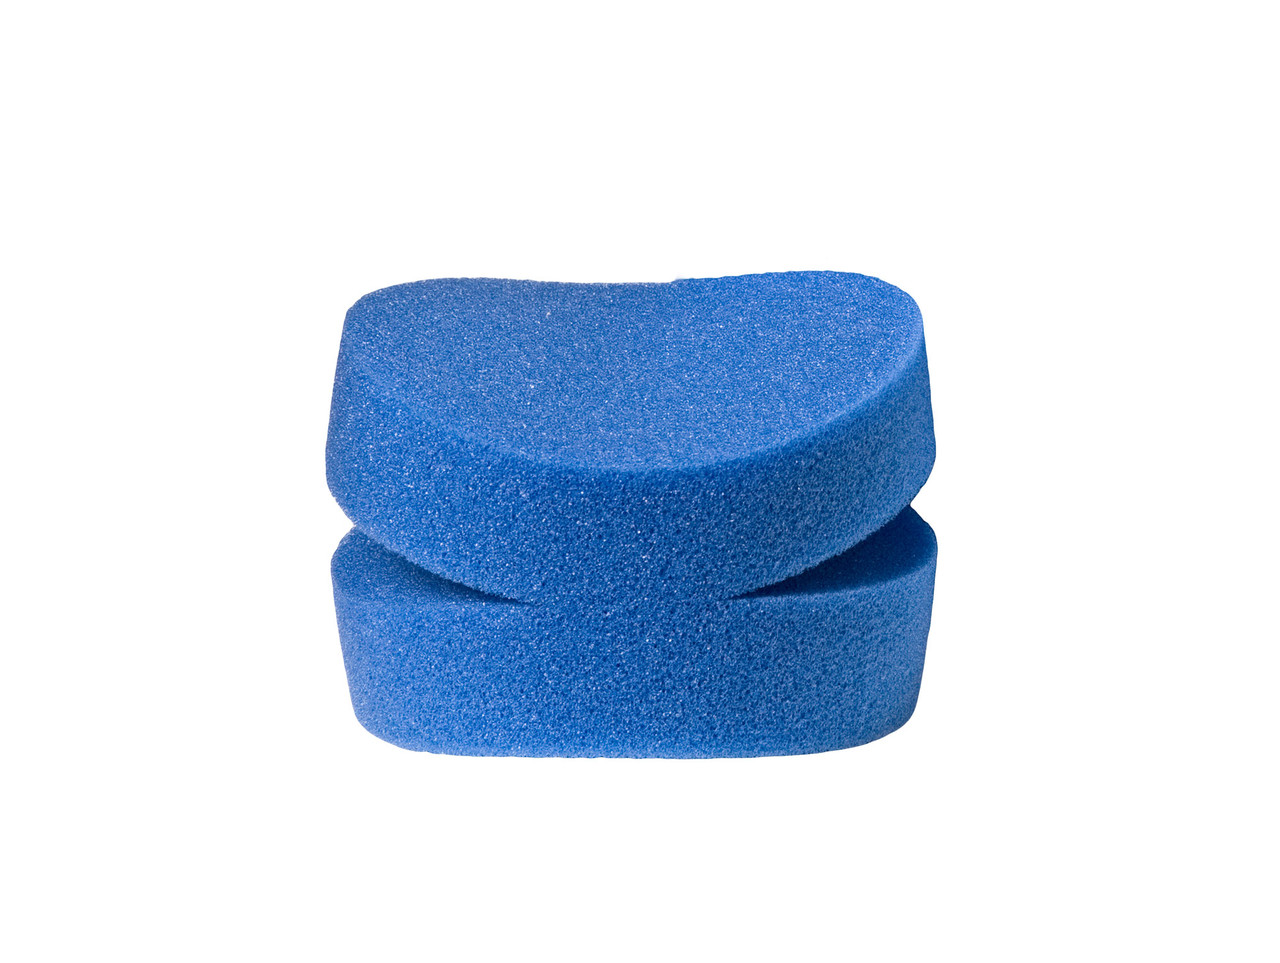 40840 100x50 мм Апликатор круглый надрезаный под пальцы, мягкий-Flexipads Split Blue Detail Foams (2 шт.)